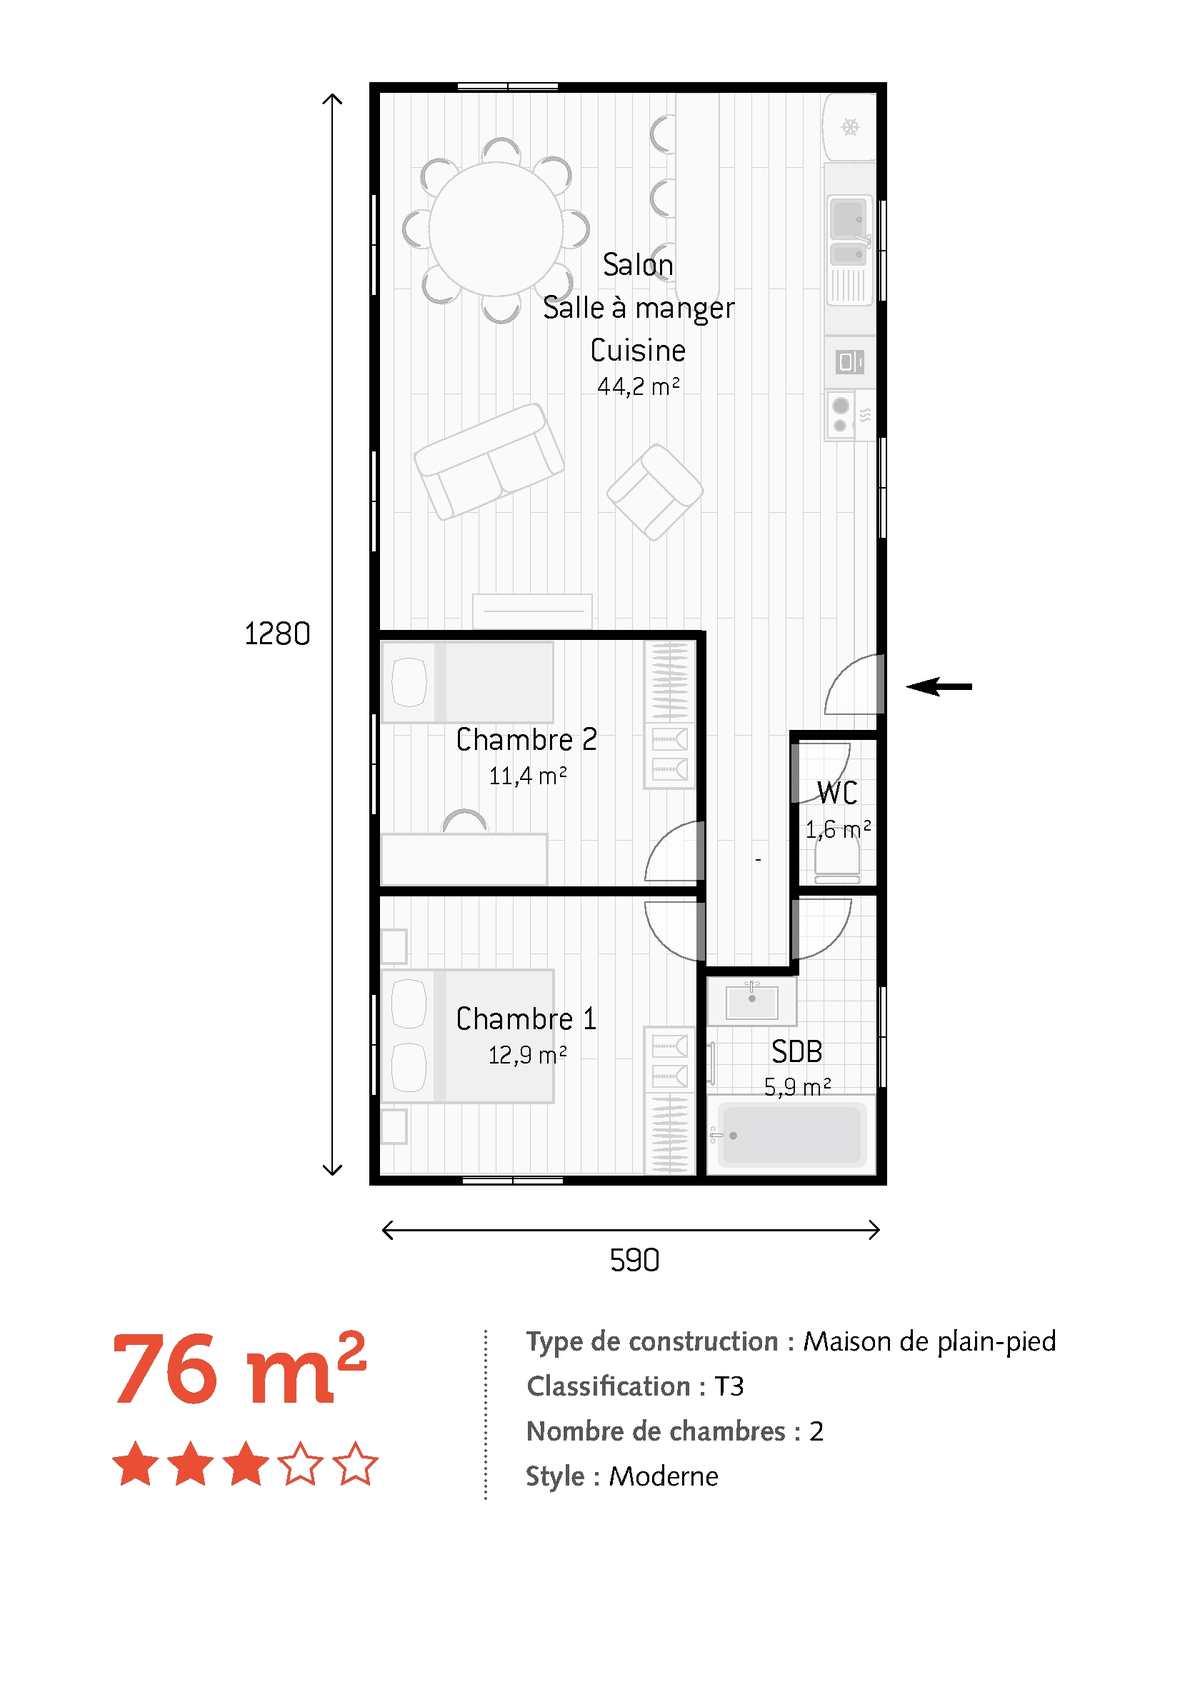 Plans 40 Maisons Calameo Downloader